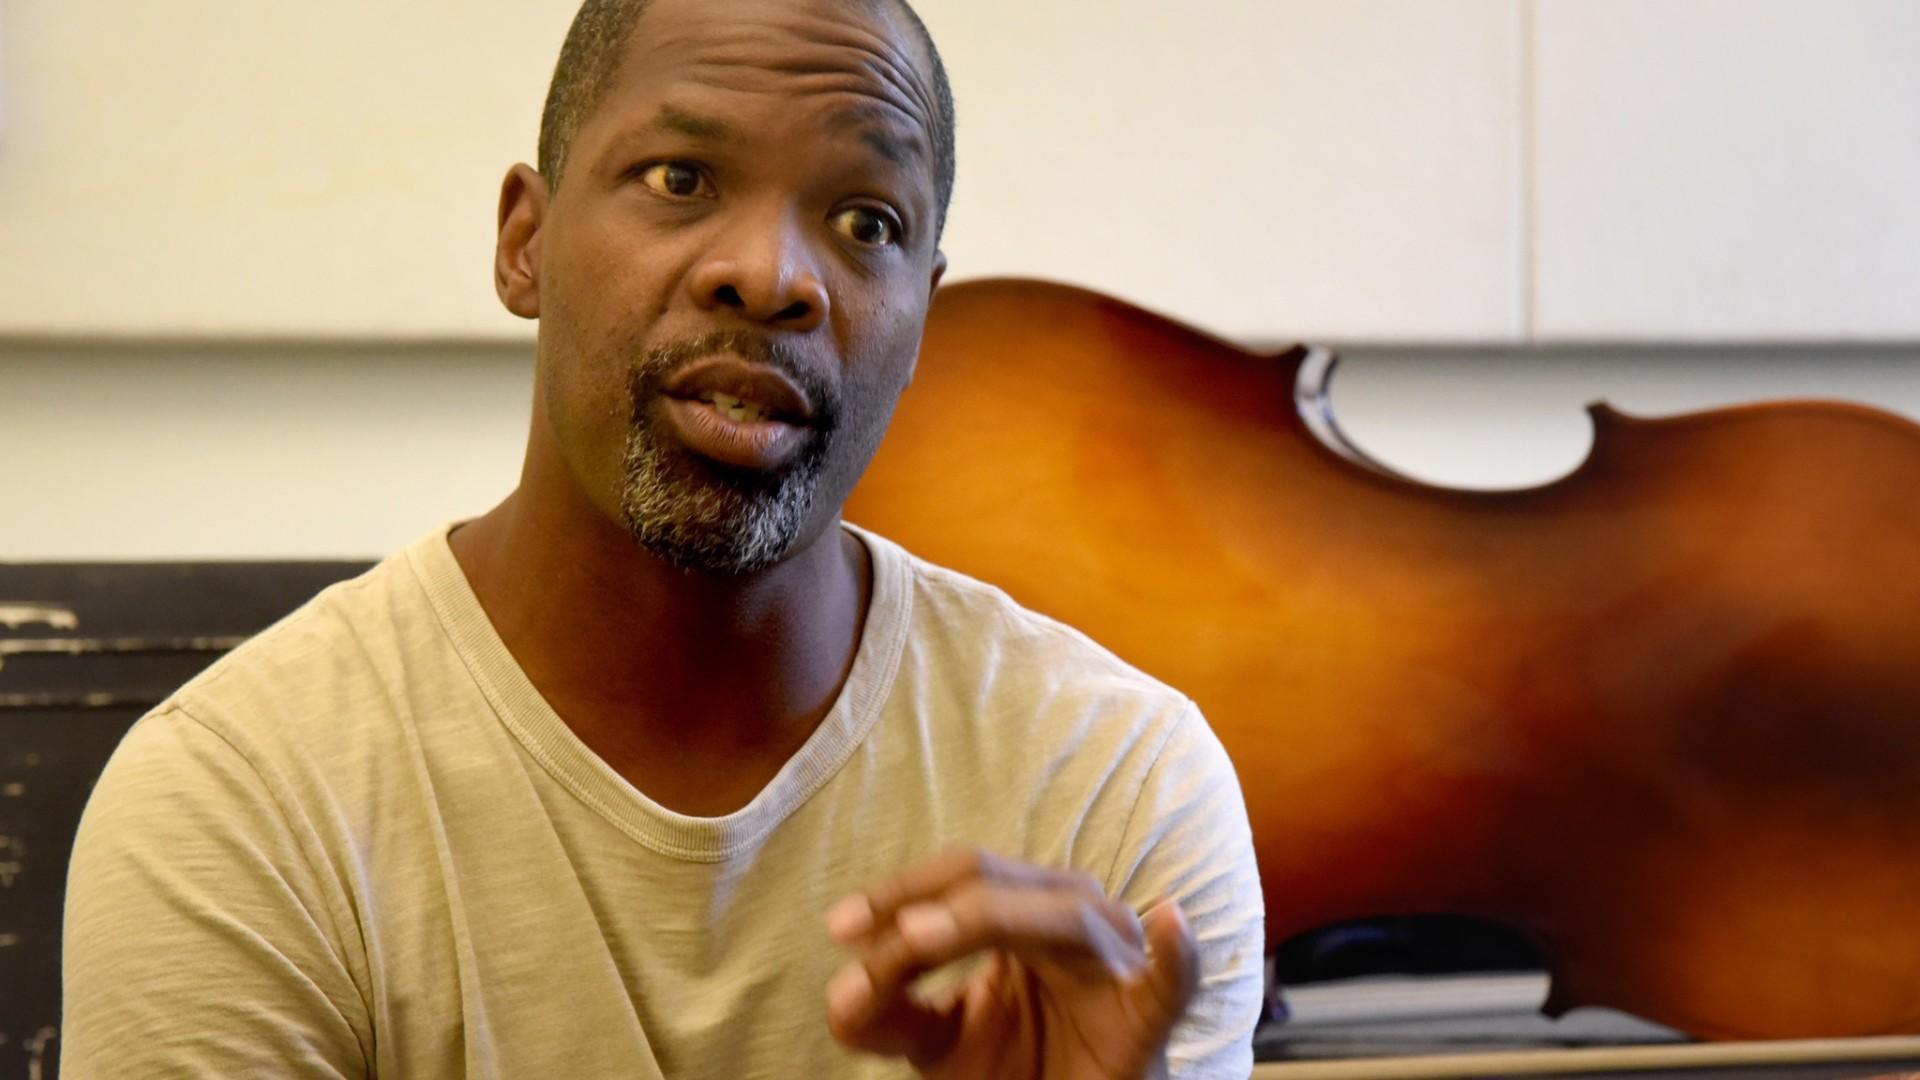 baltimoresun.com - Talia Richman - Baltimore schools stepping up efforts to recruit, retain more black teachers